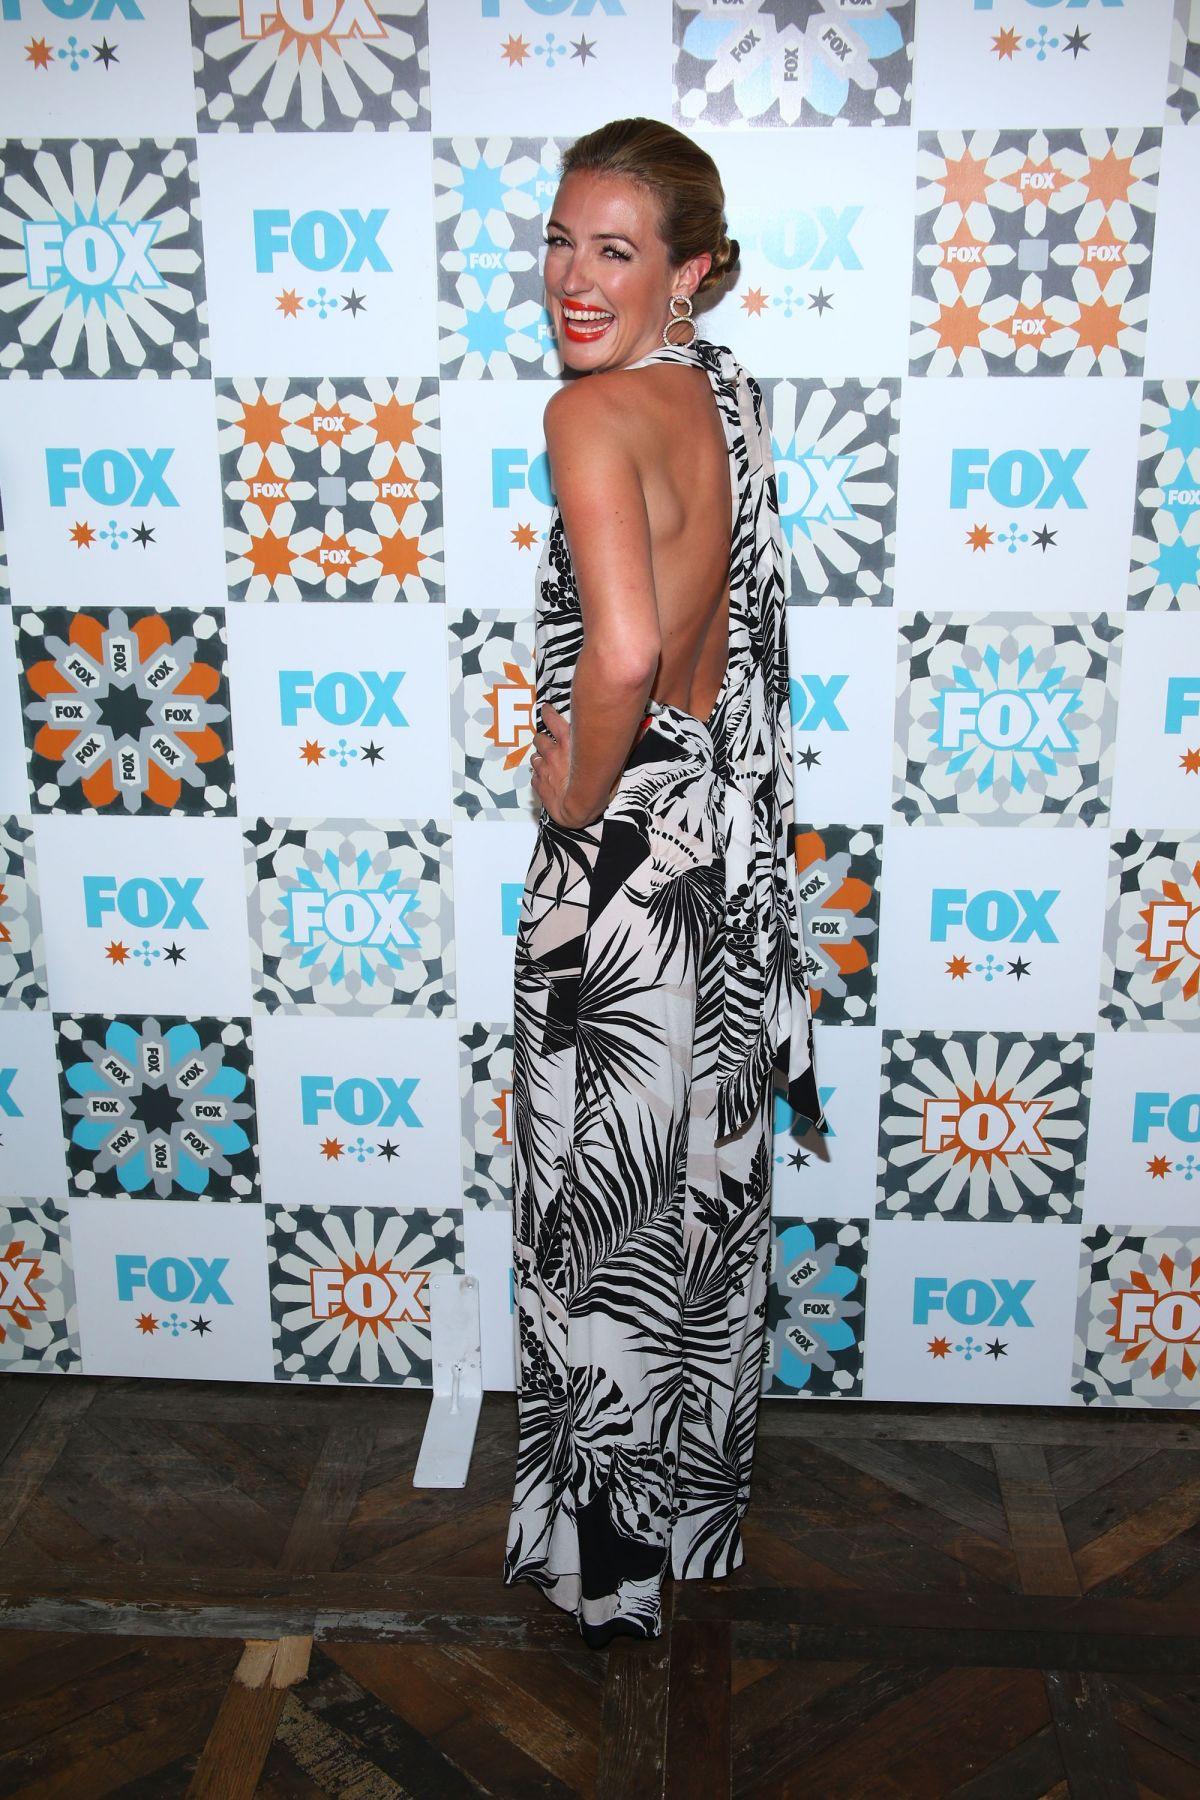 CAT DEELEY at FOX 2014 TCA Summer Tour